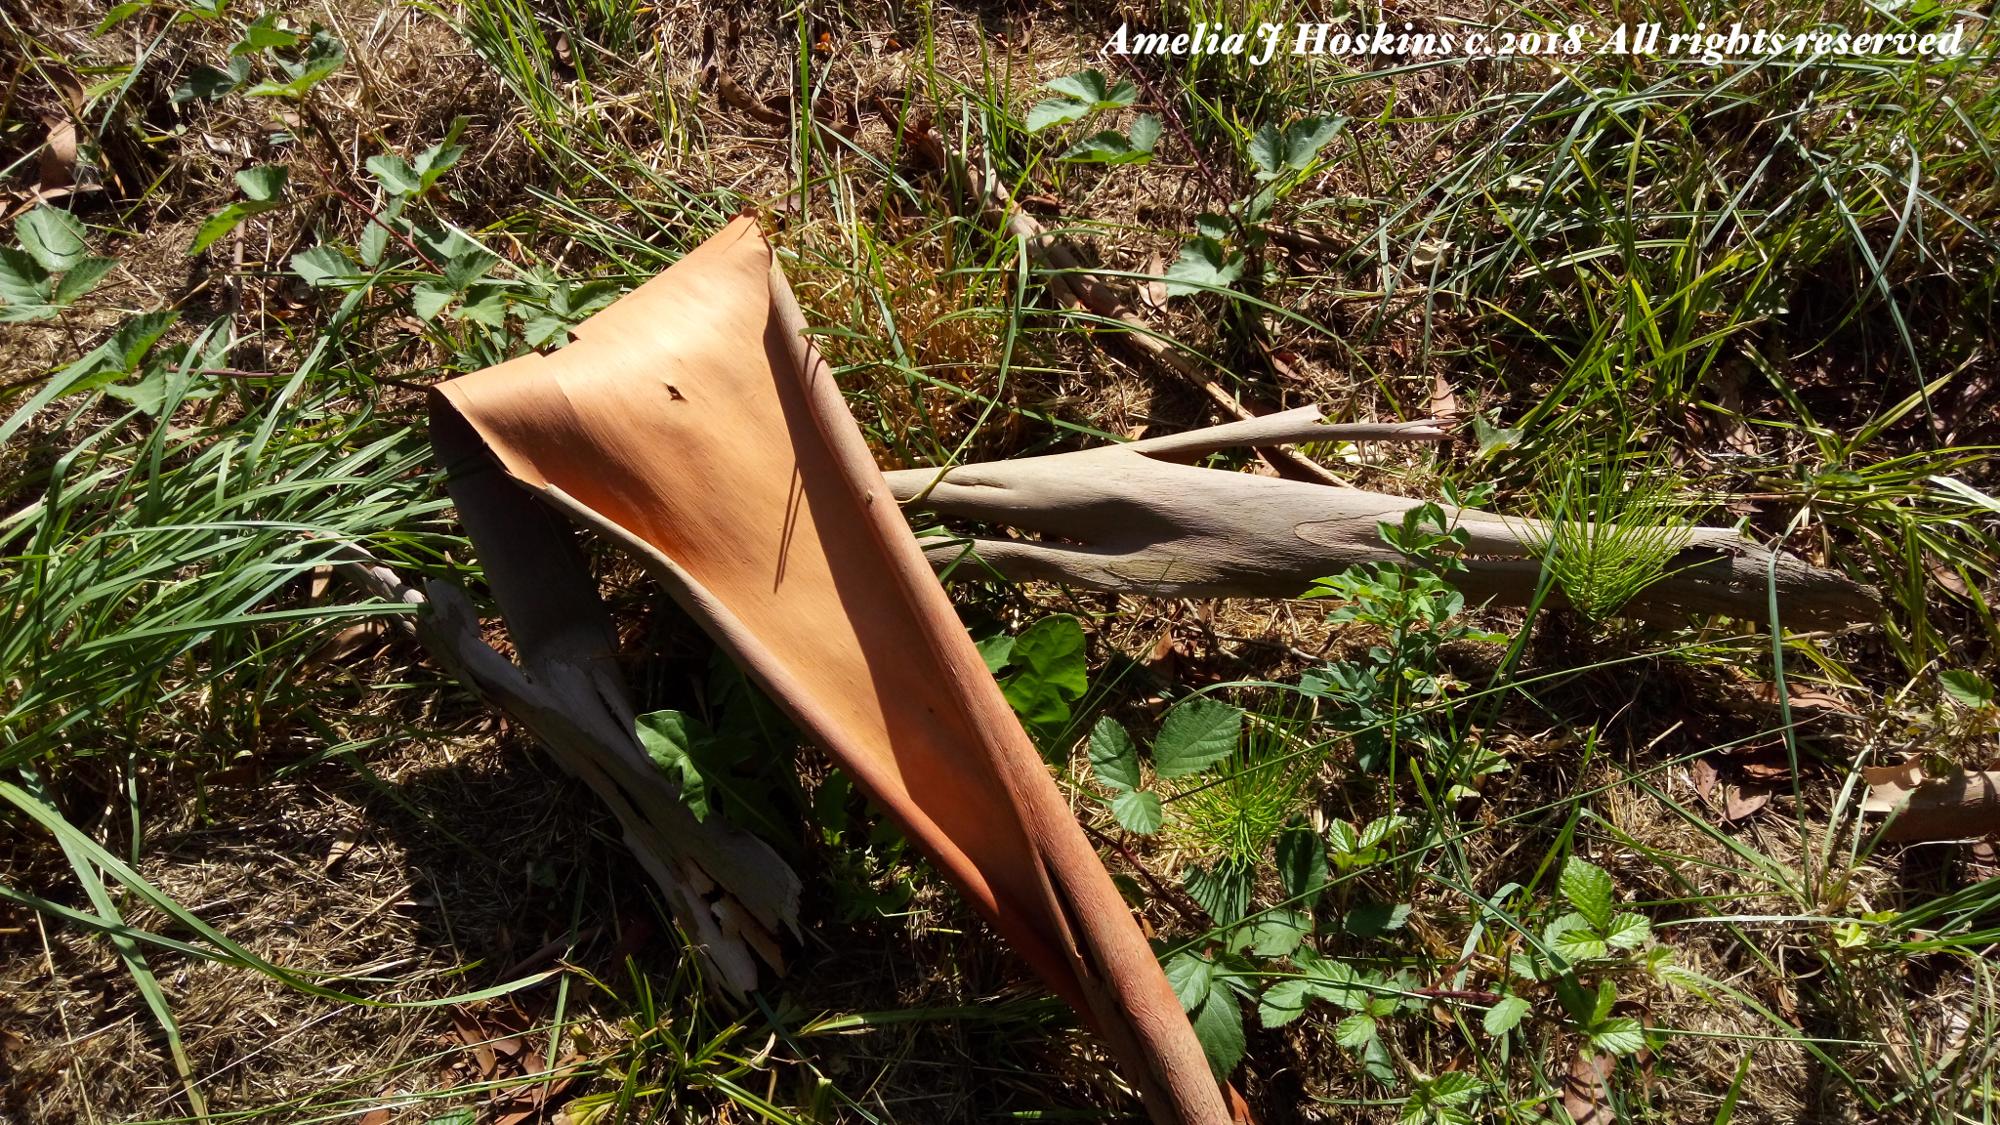 Eucalyptus shedded bark ground- IMG_20180808_165249 - 004 - edited annotated